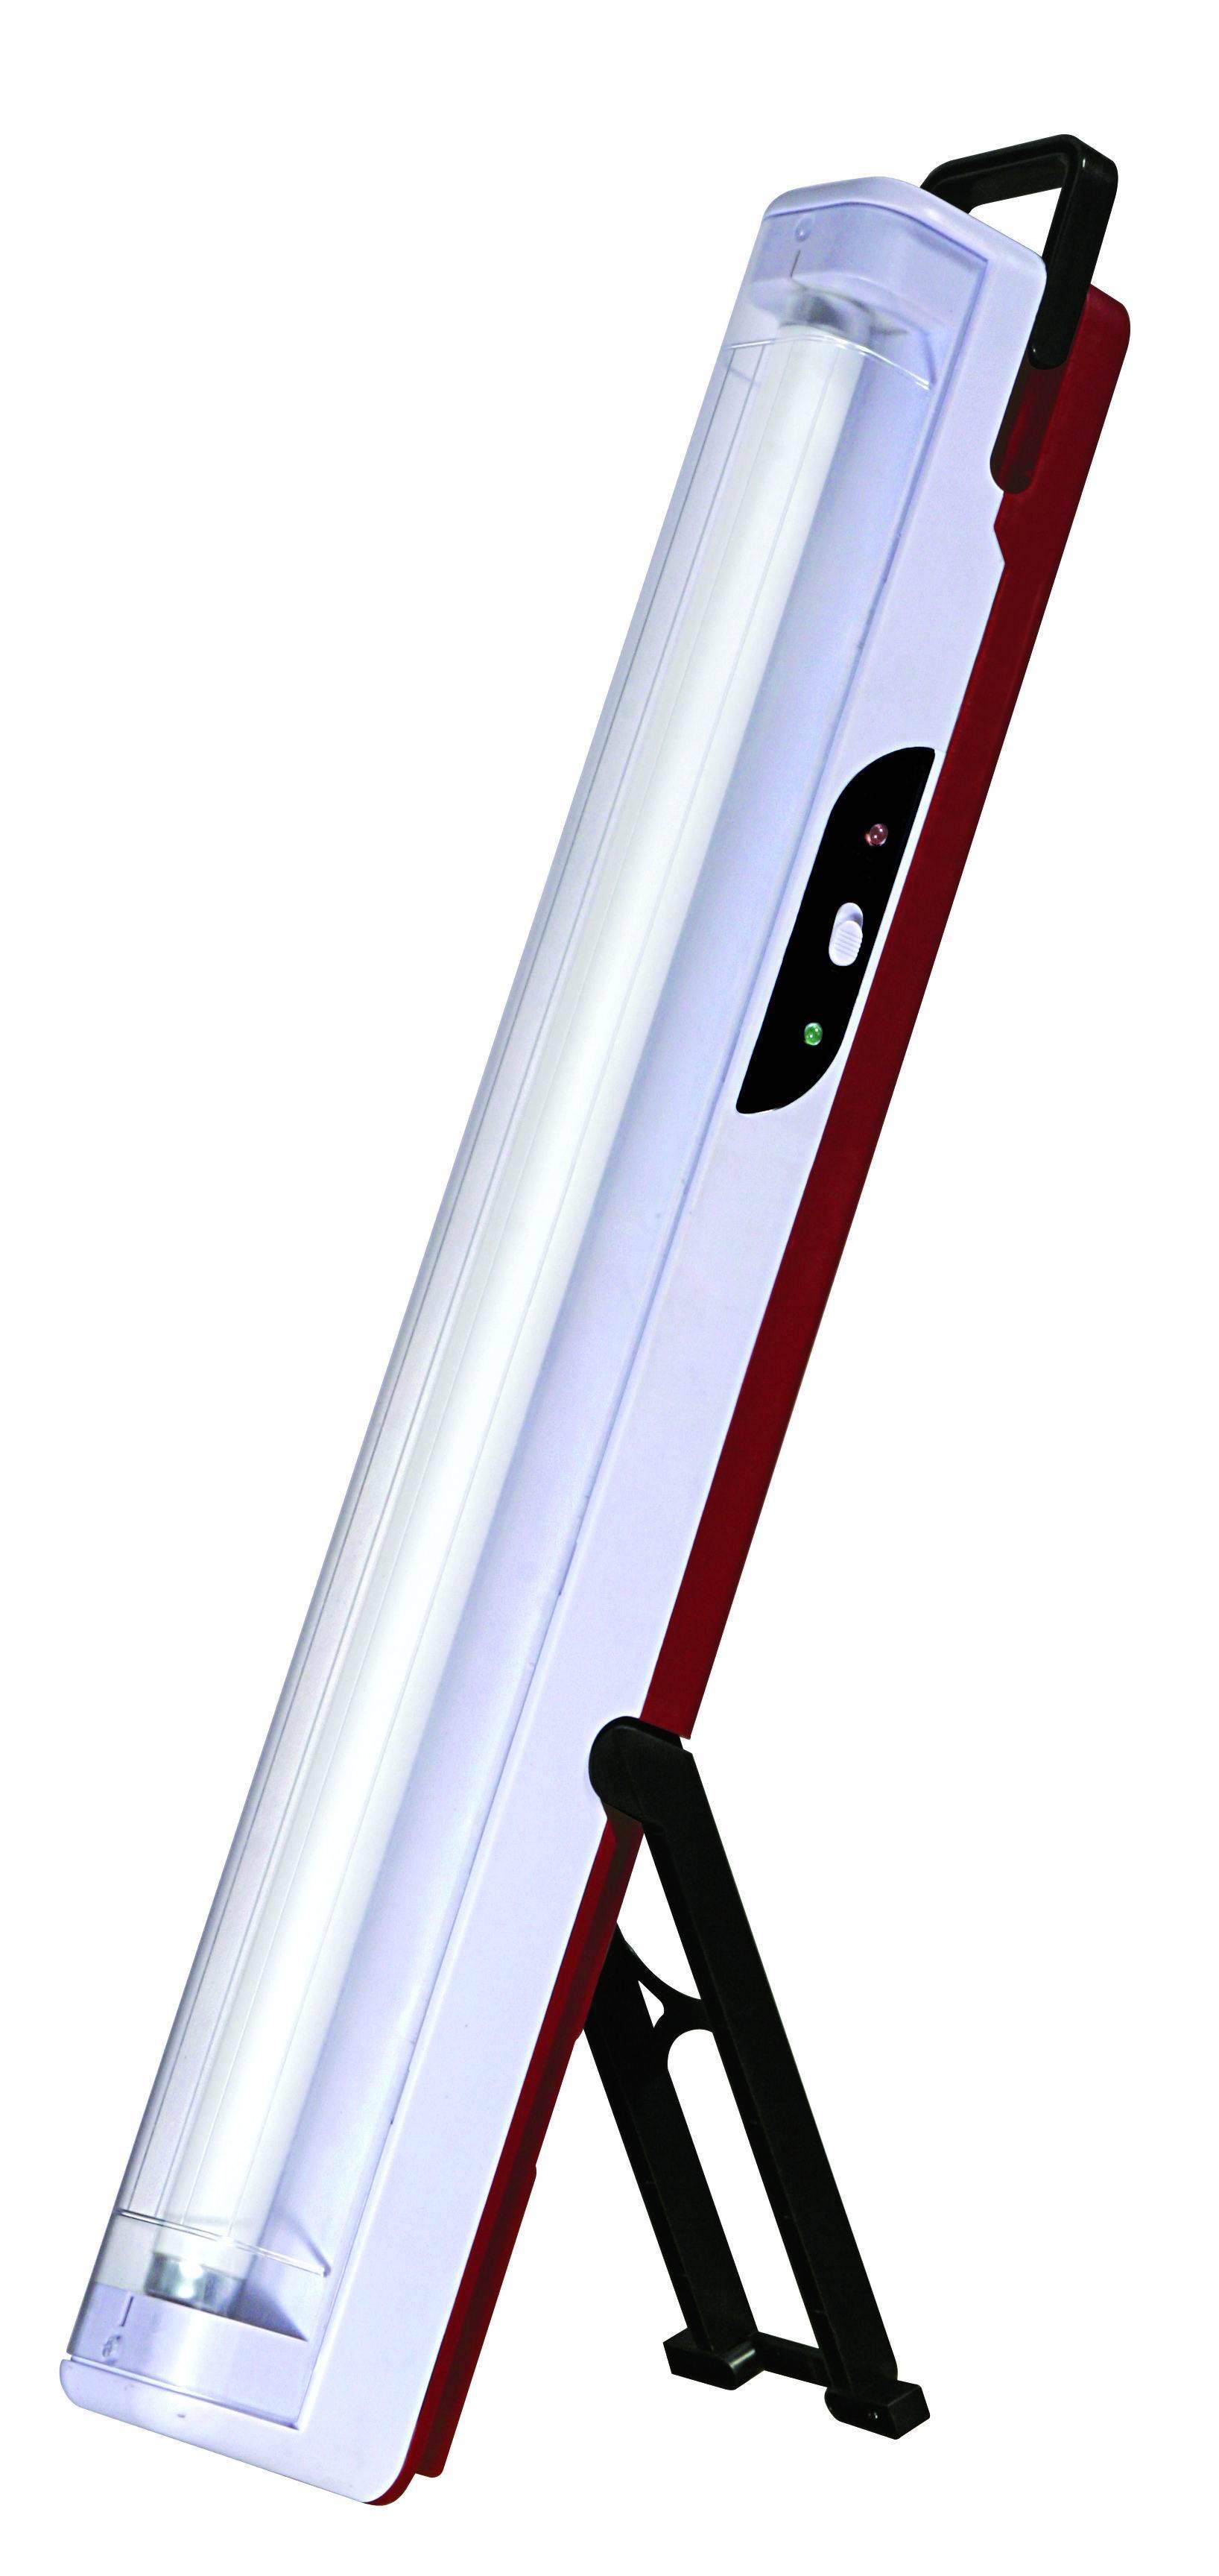 Wall Hanging Emergency Light : EMERGENCY WALL-MOUNTED LANTERN - YINGGAO ELECTRIC APPLIANCE MANUFACTORY CO.LTD